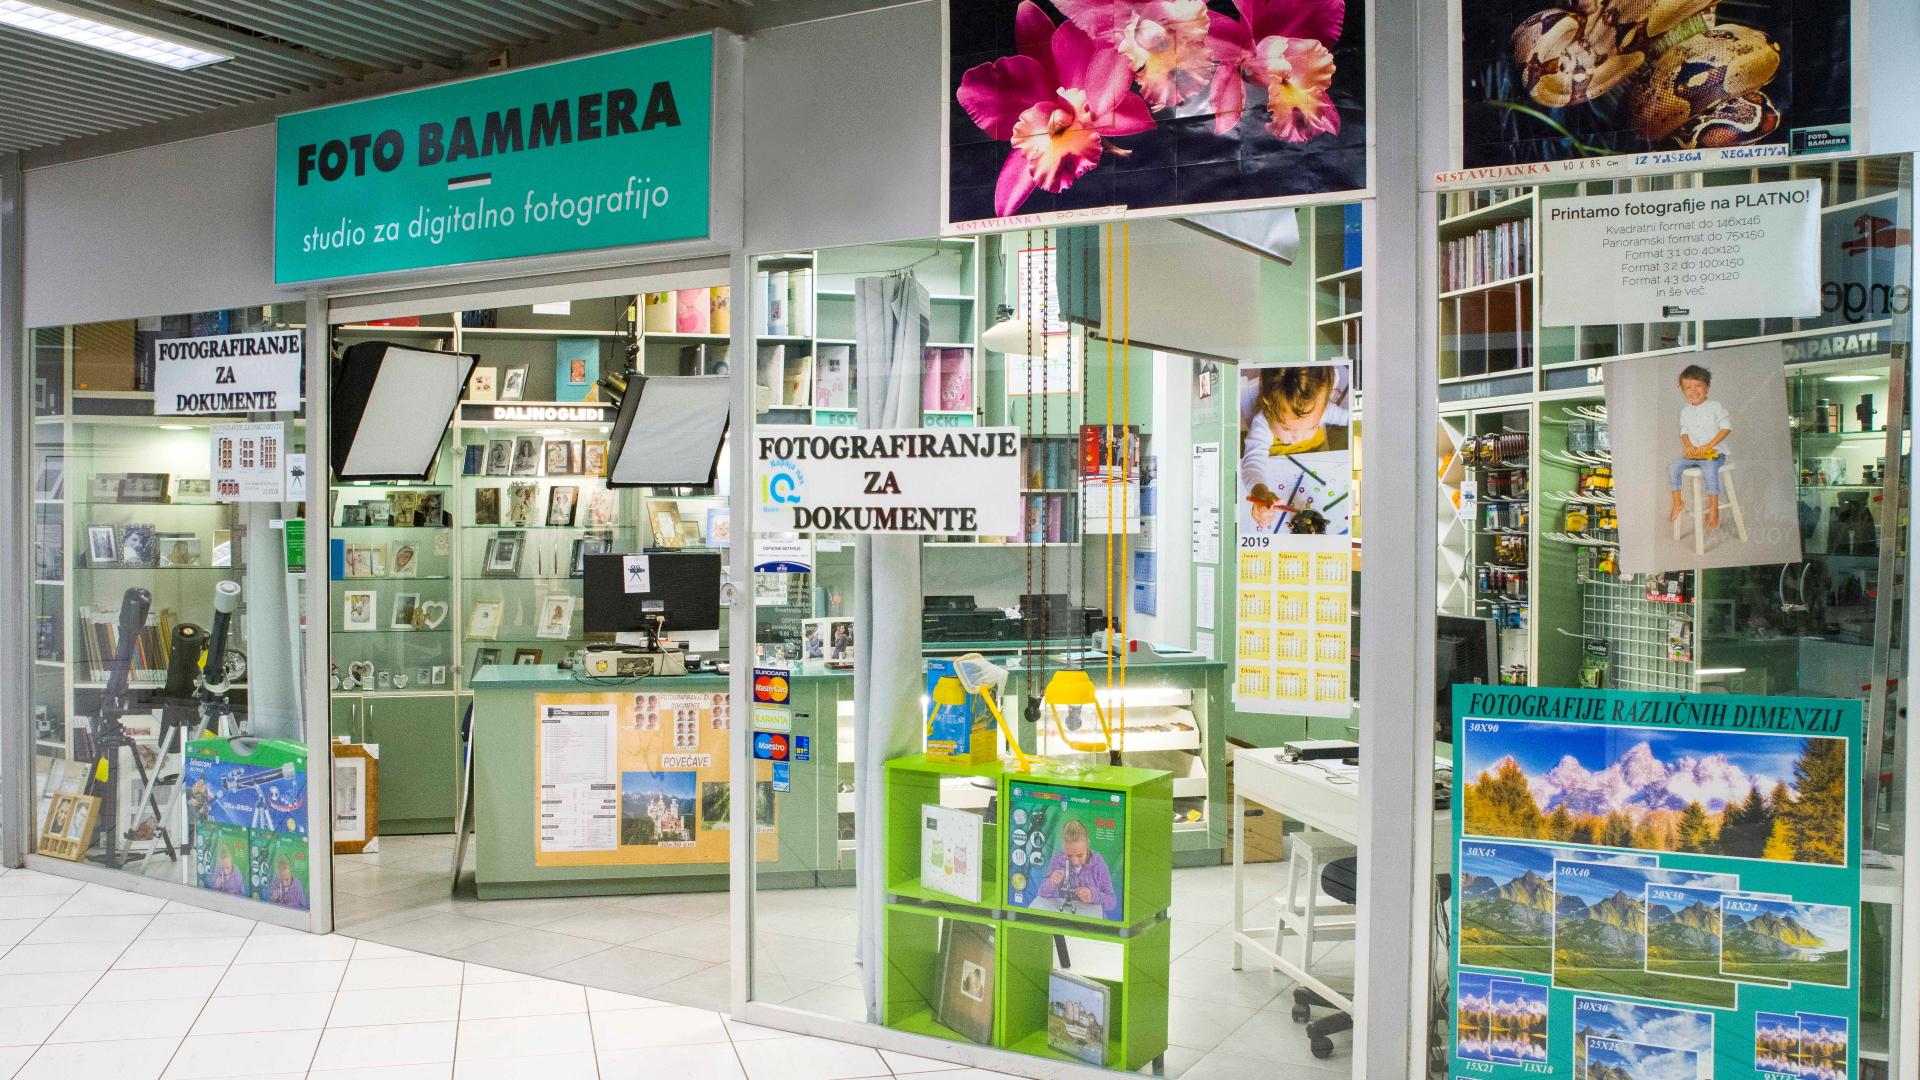 Foto Bammera